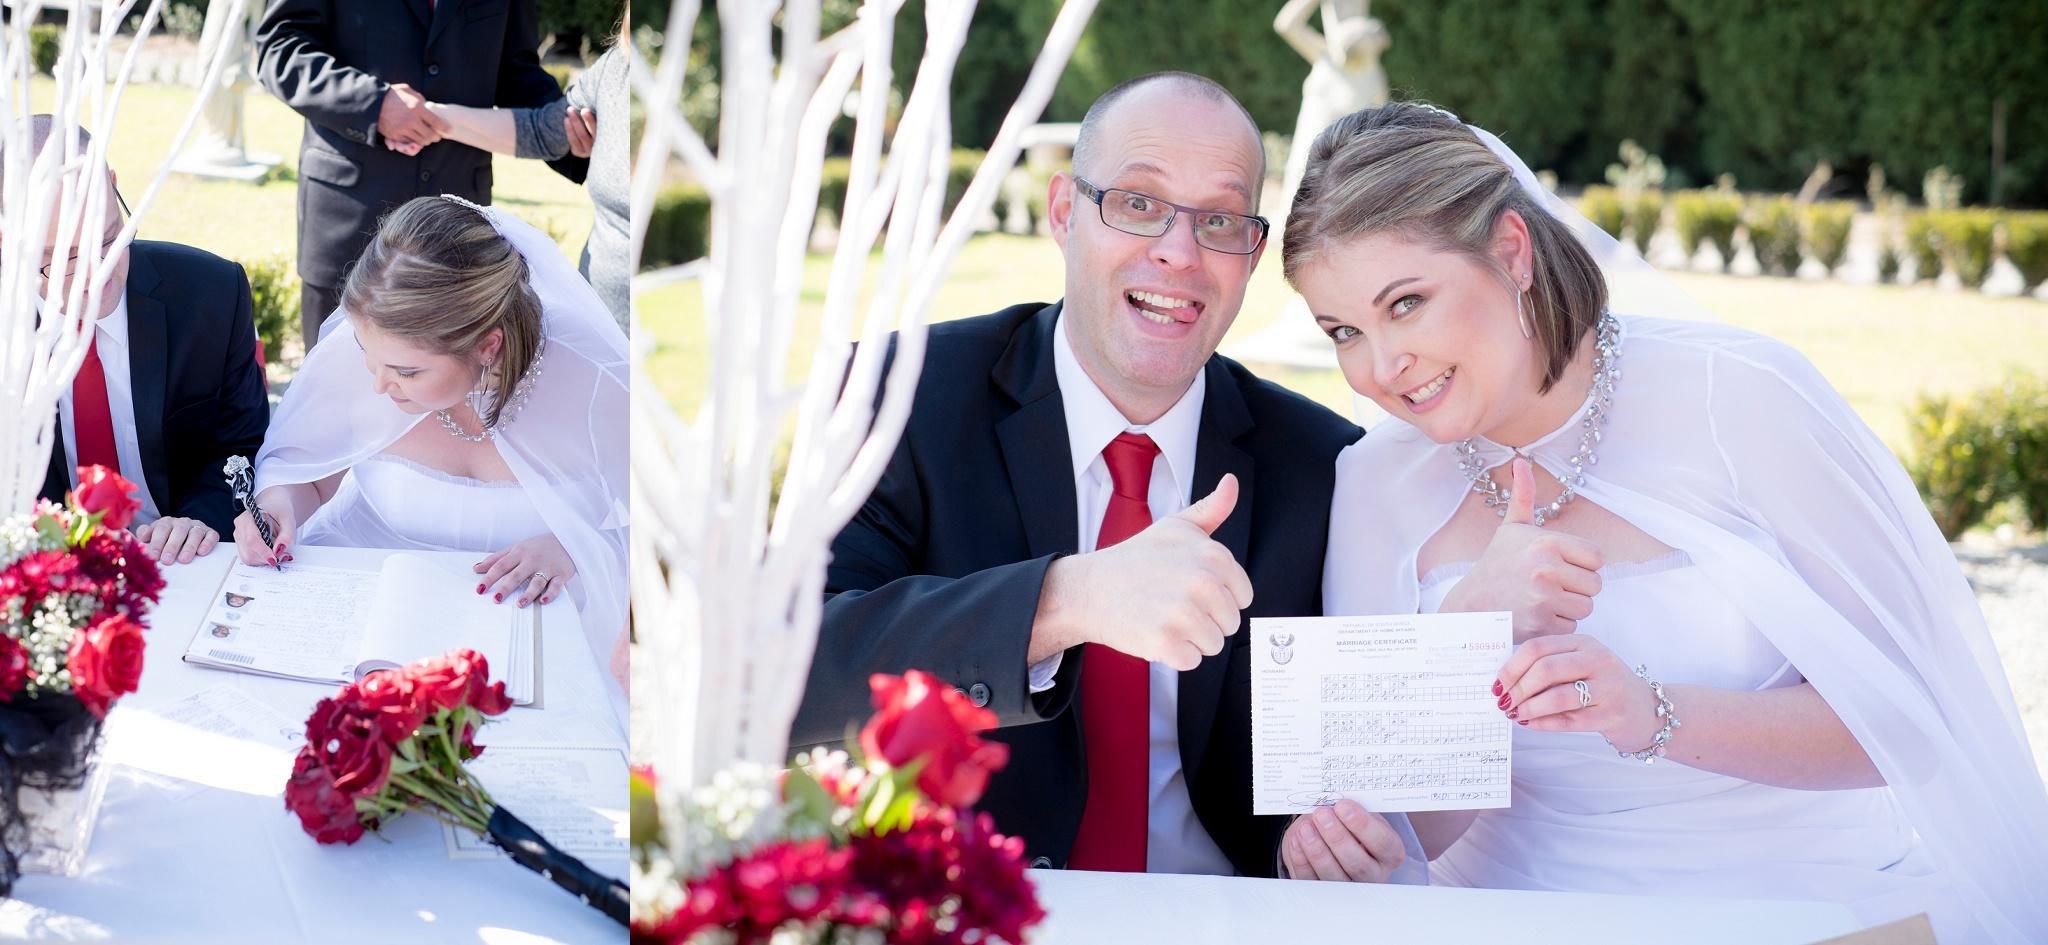 VanillaSilk_WeddingPhotography_Travelling_0119